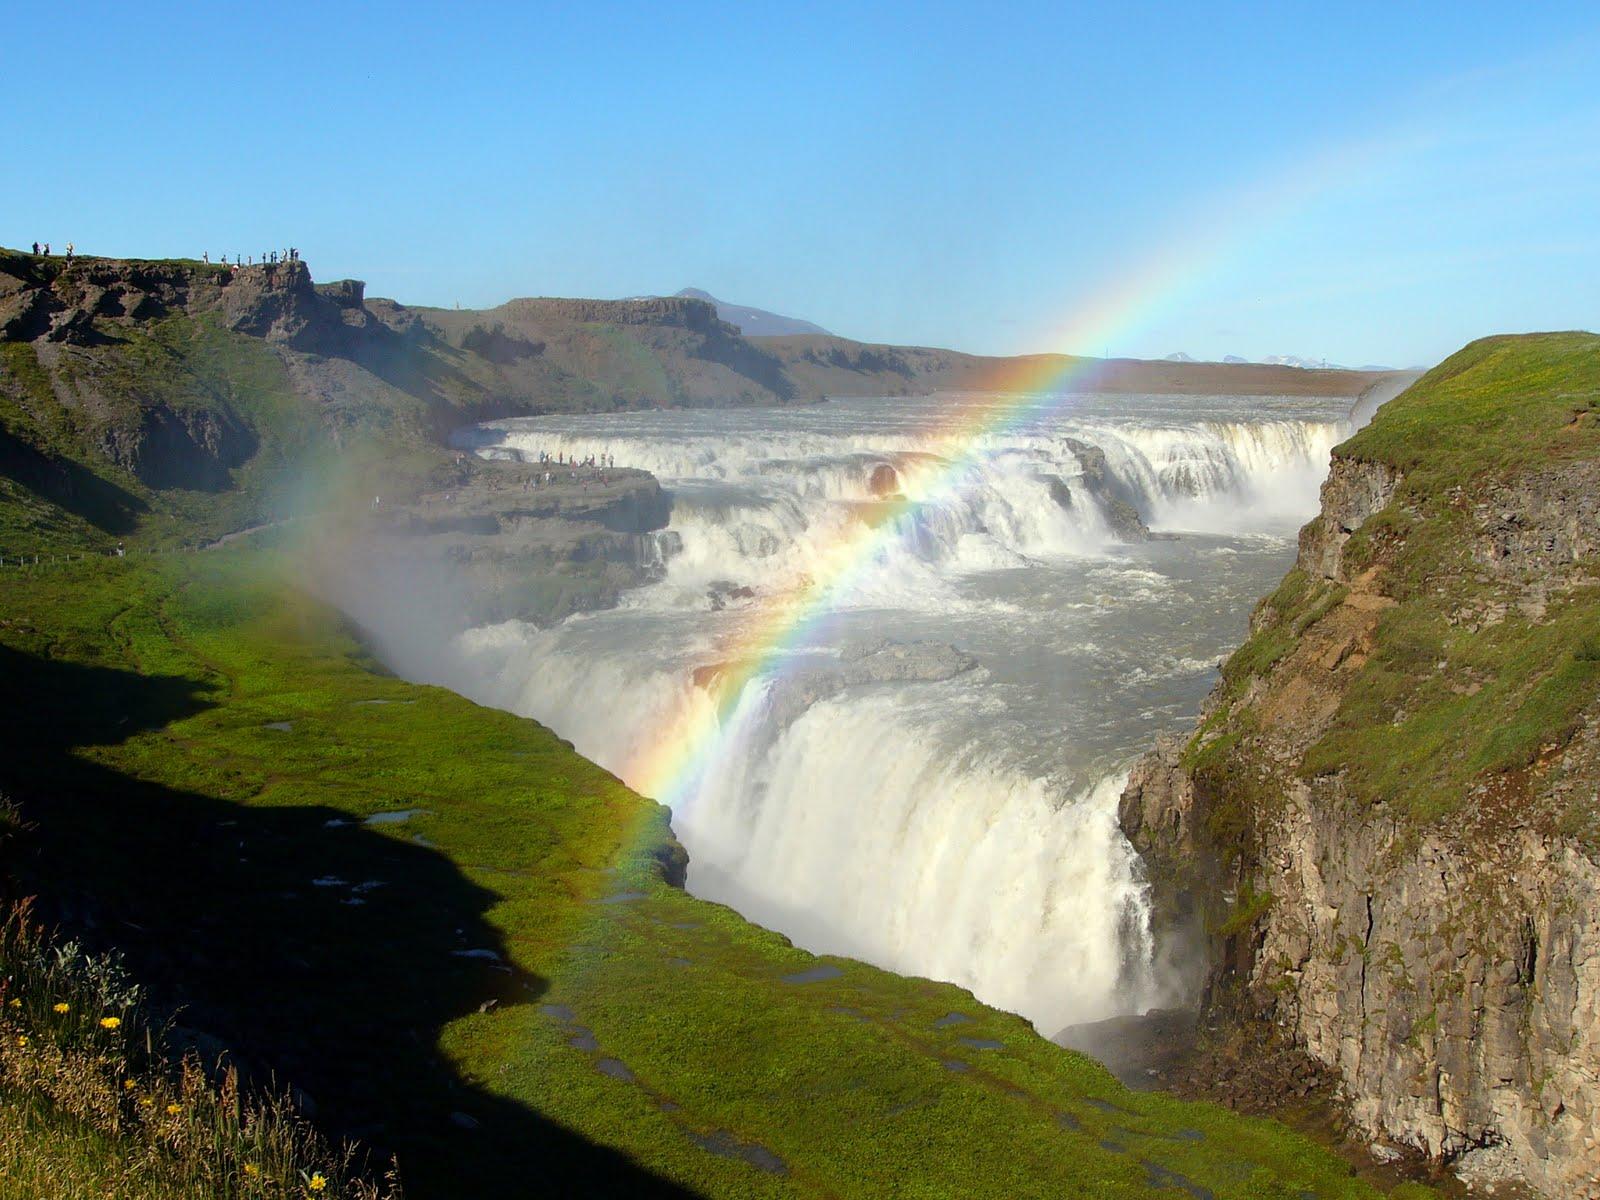 http://2.bp.blogspot.com/-vWJn8lDOQW8/TiMh74tFD9I/AAAAAAAACMs/ZAODlgT4SWE/s1600/rainbow_hd_wallpaper_3.jpg